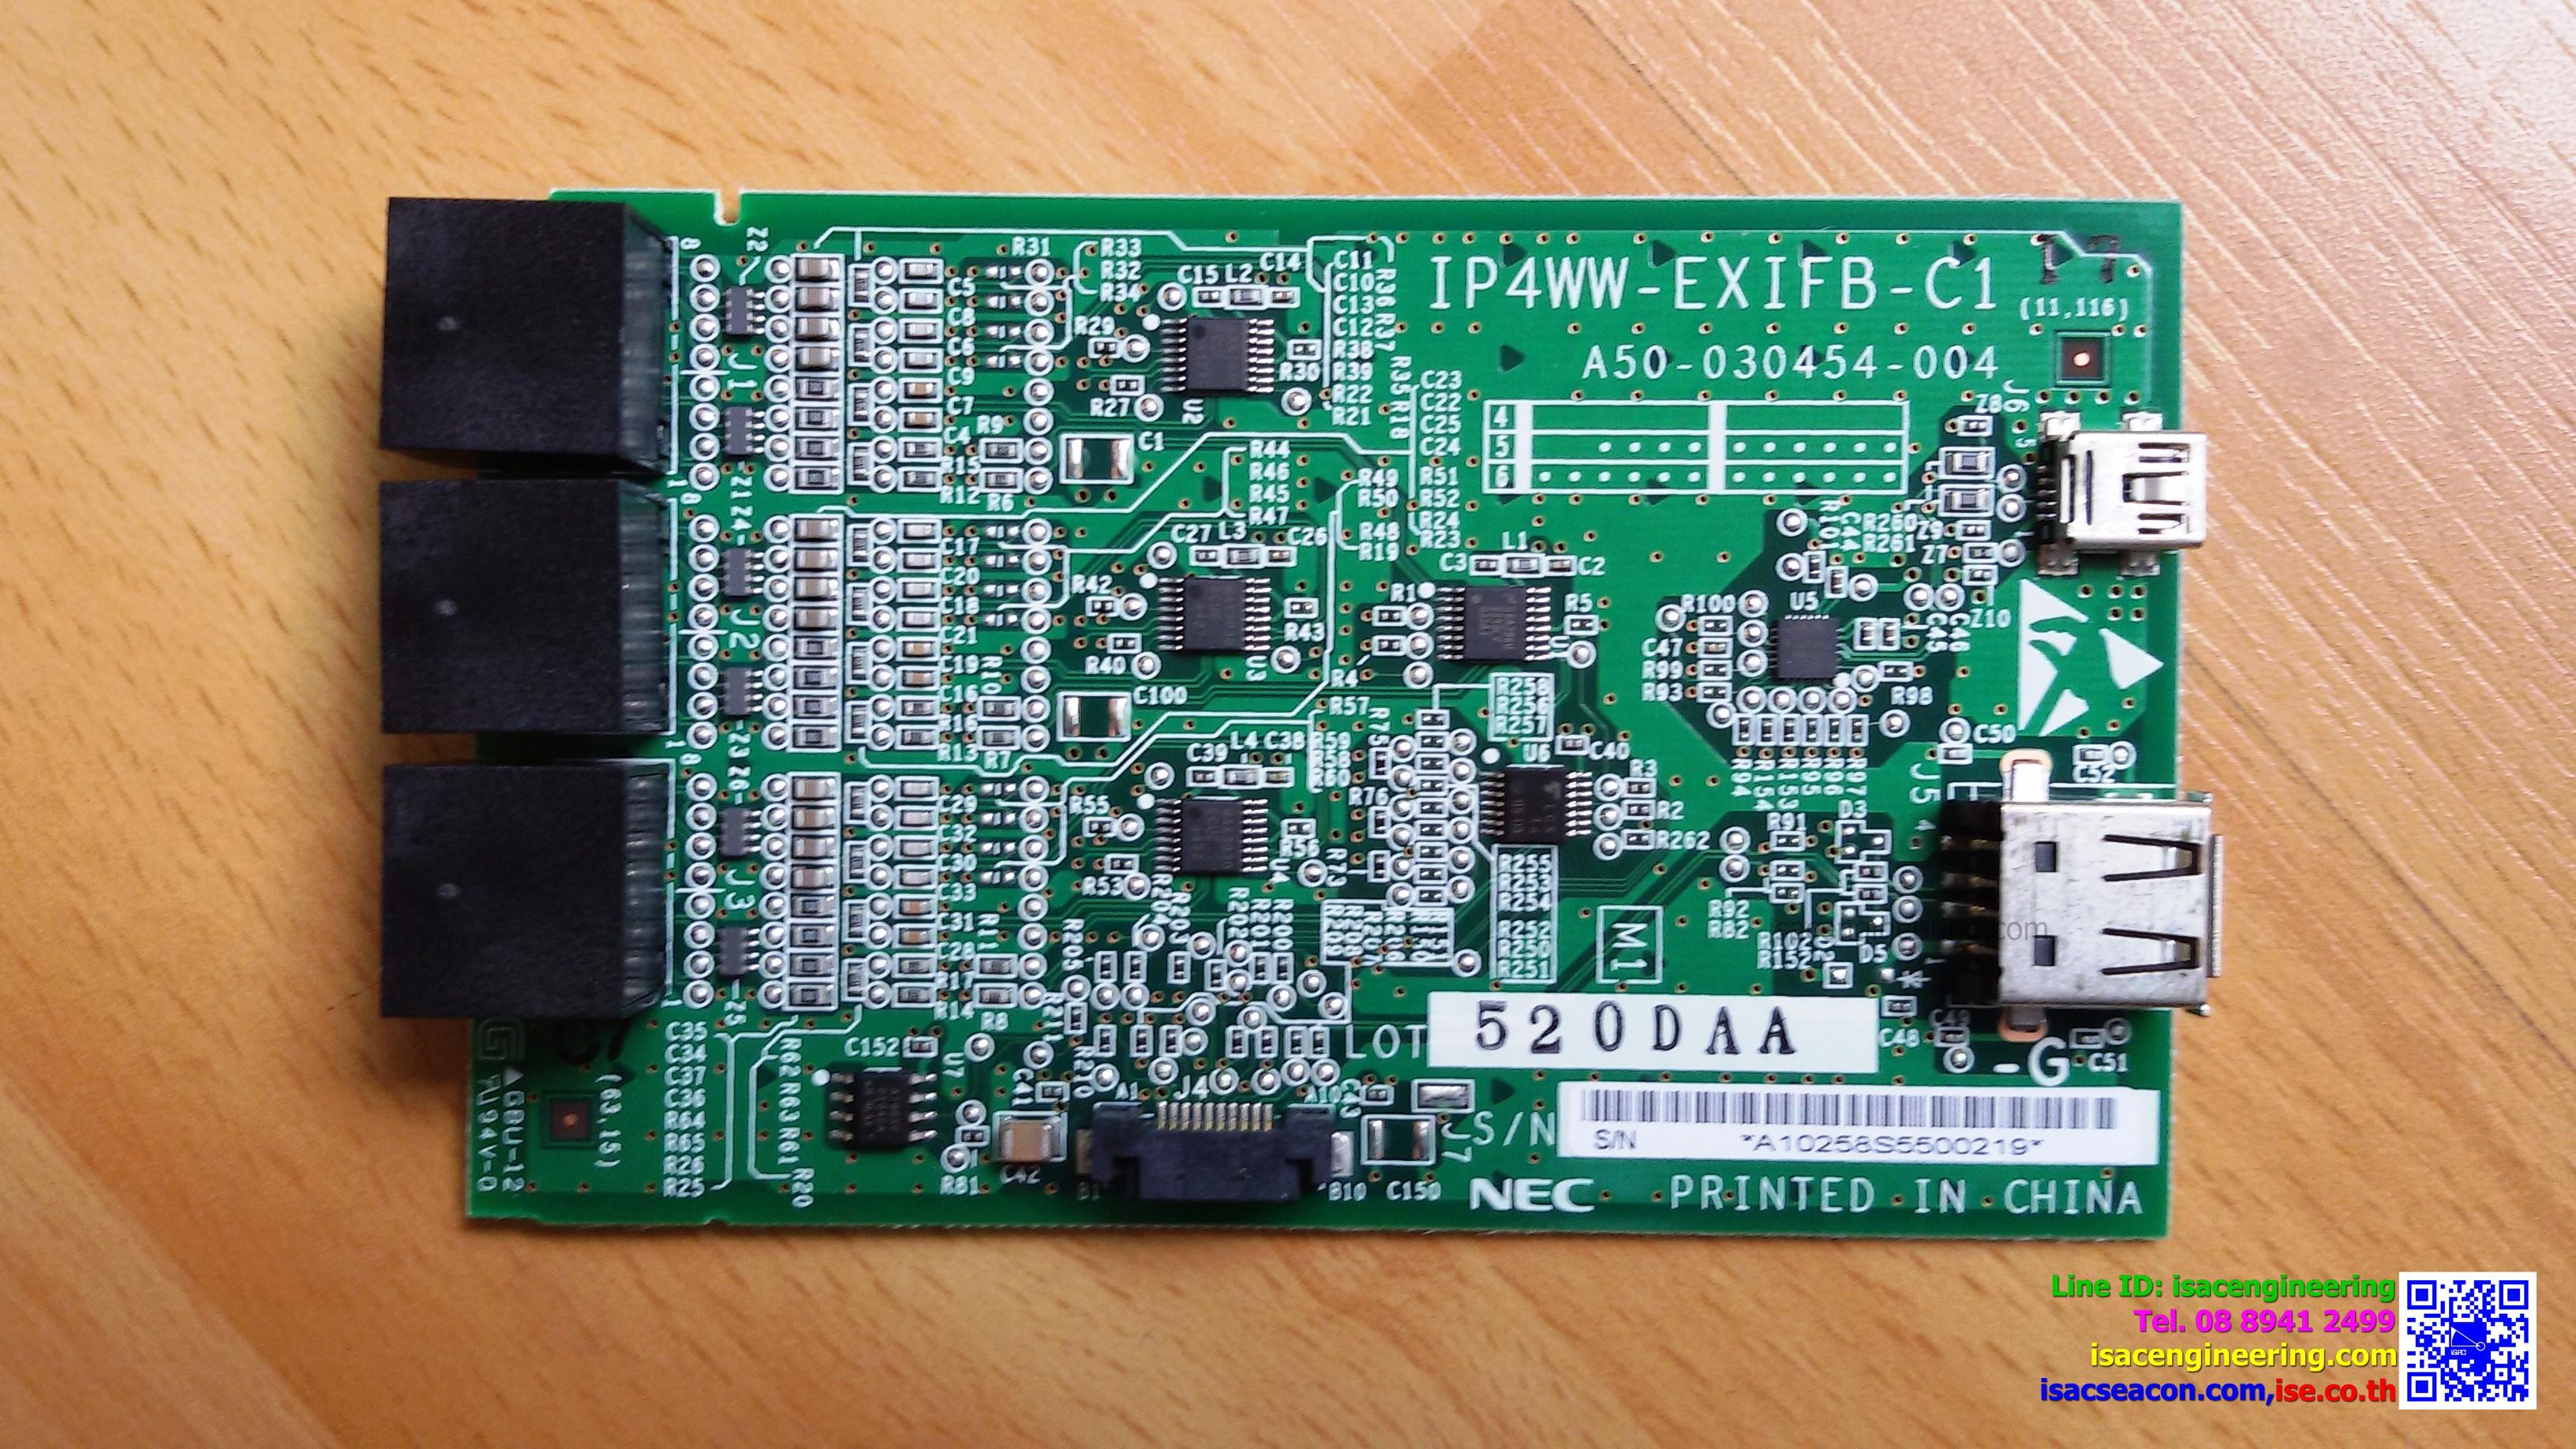 IP4WW-EXIFB-C1 (Bus Cardfor Main KSU to Connect EXP KSUs)